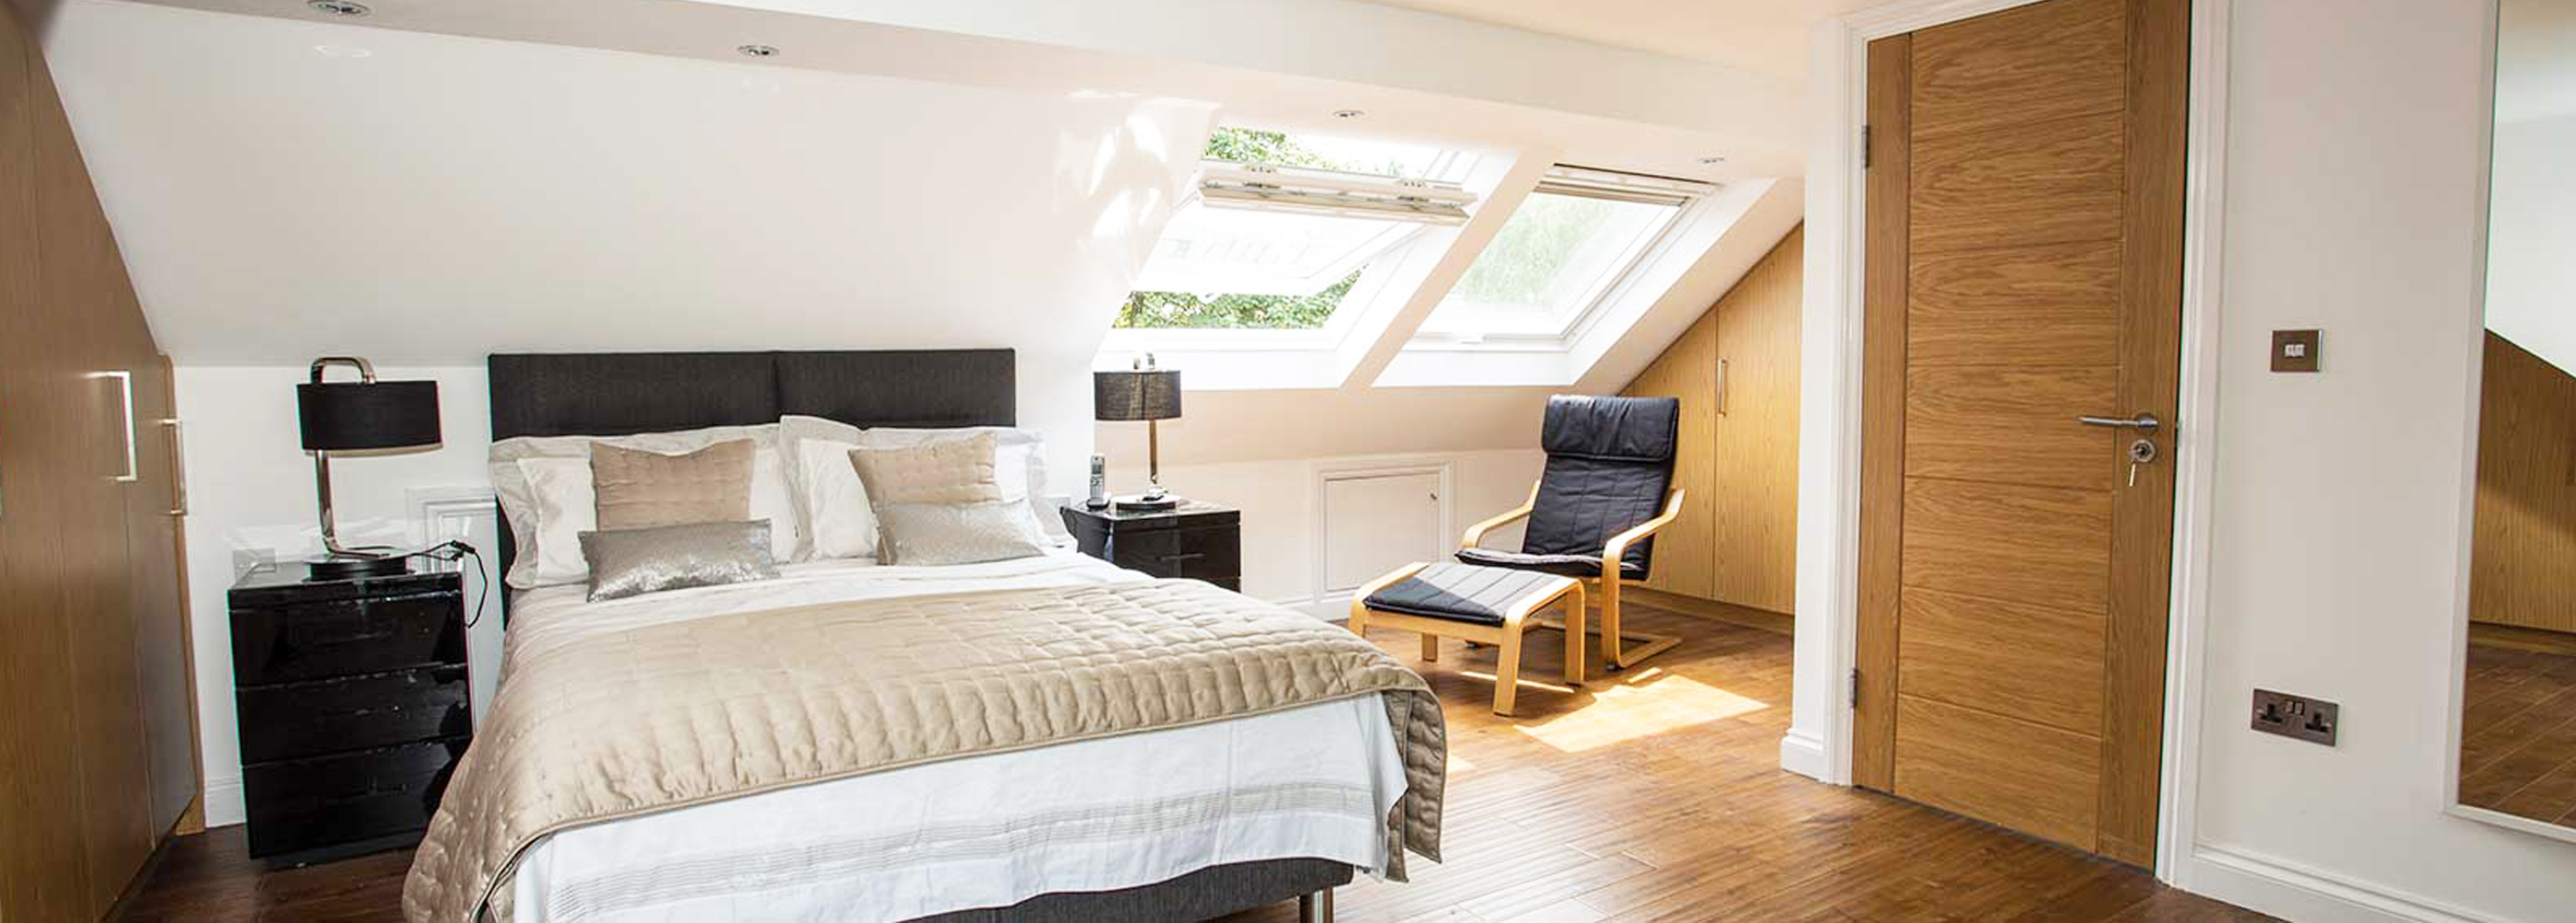 House/Loft Extensions